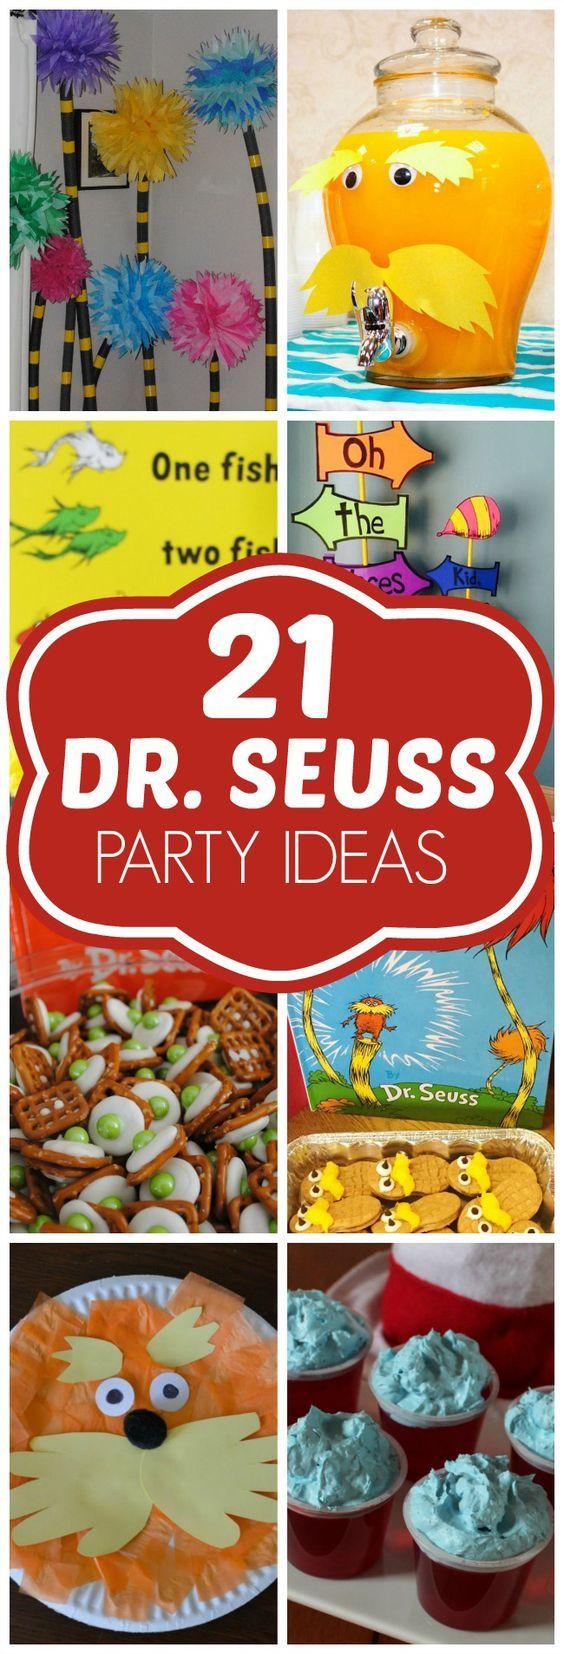 21 Diy Dr Seuss Party Ideas Dr Seuss Birthday Pretty